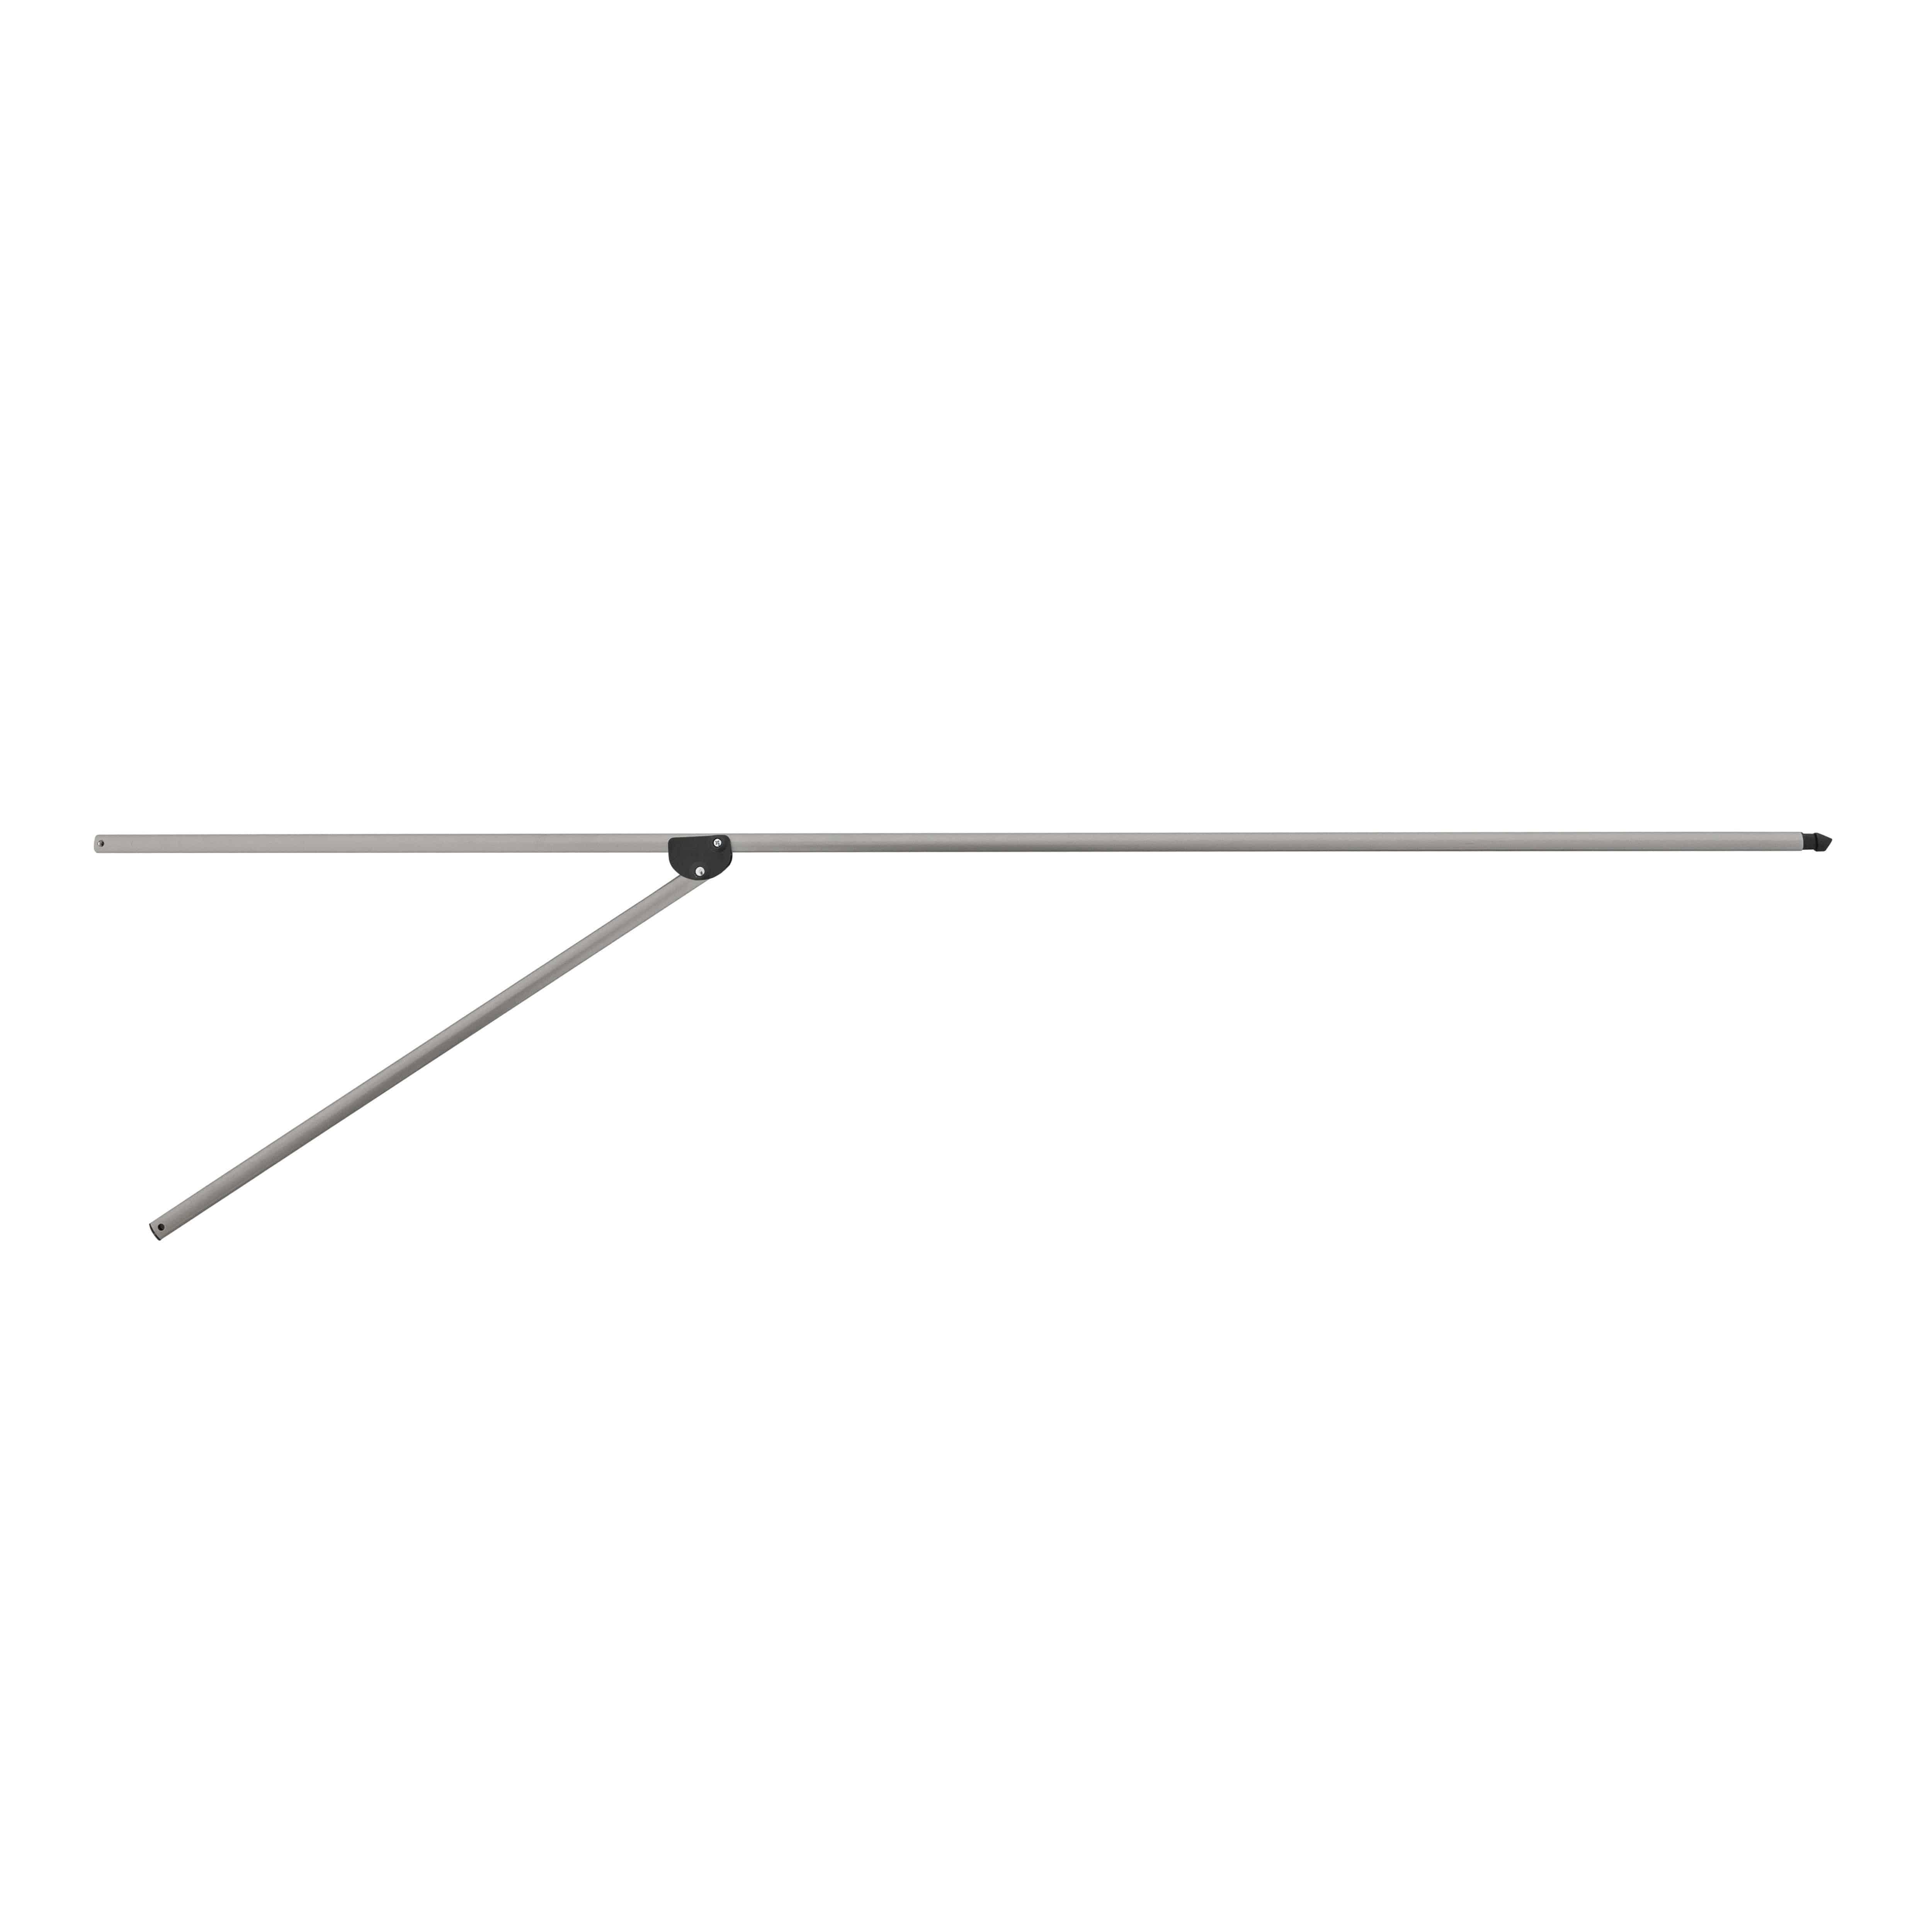 Knirps Strut Short strut for parasol Automatic 230x150